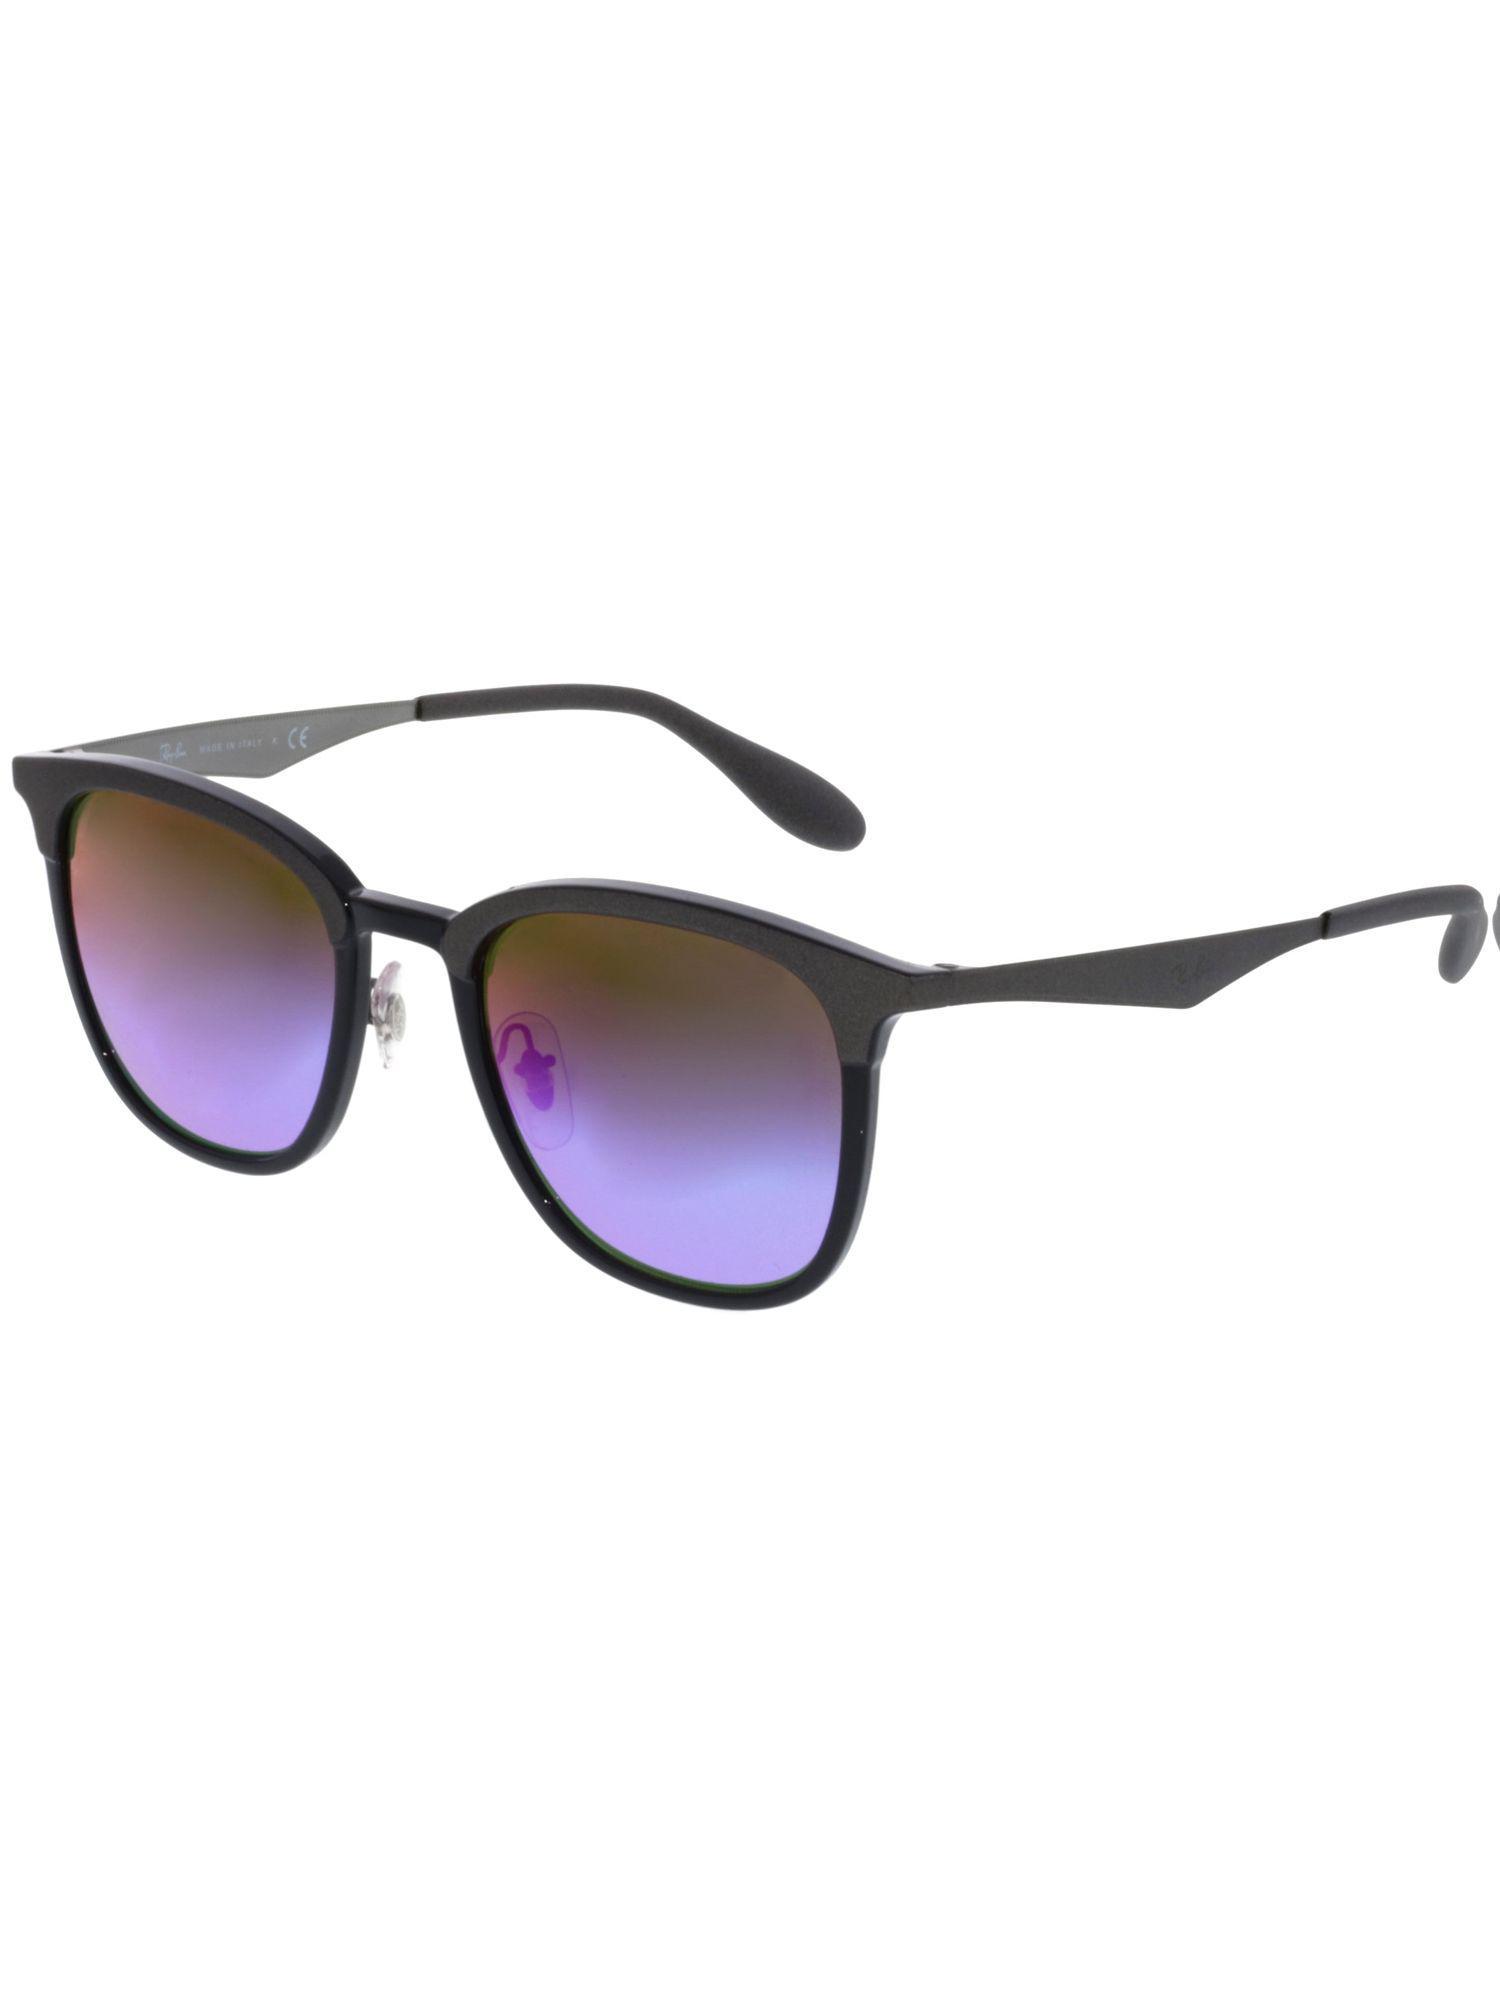 fa996d954fe Lyst - Ray-Ban Mirrored Rb4278-6284b1-51 Black Square Sunglasses